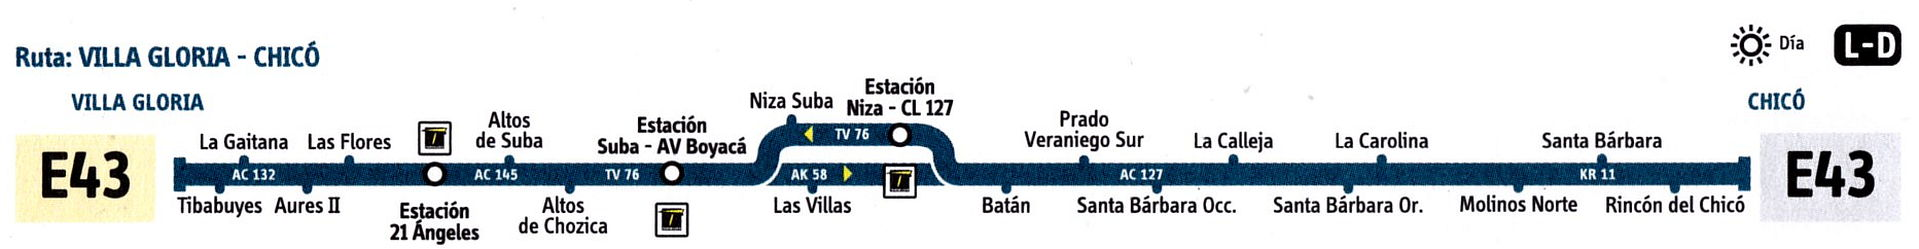 Ruta SITP: E43 Villa Gloria ↔ Chicó [Urbana] 3